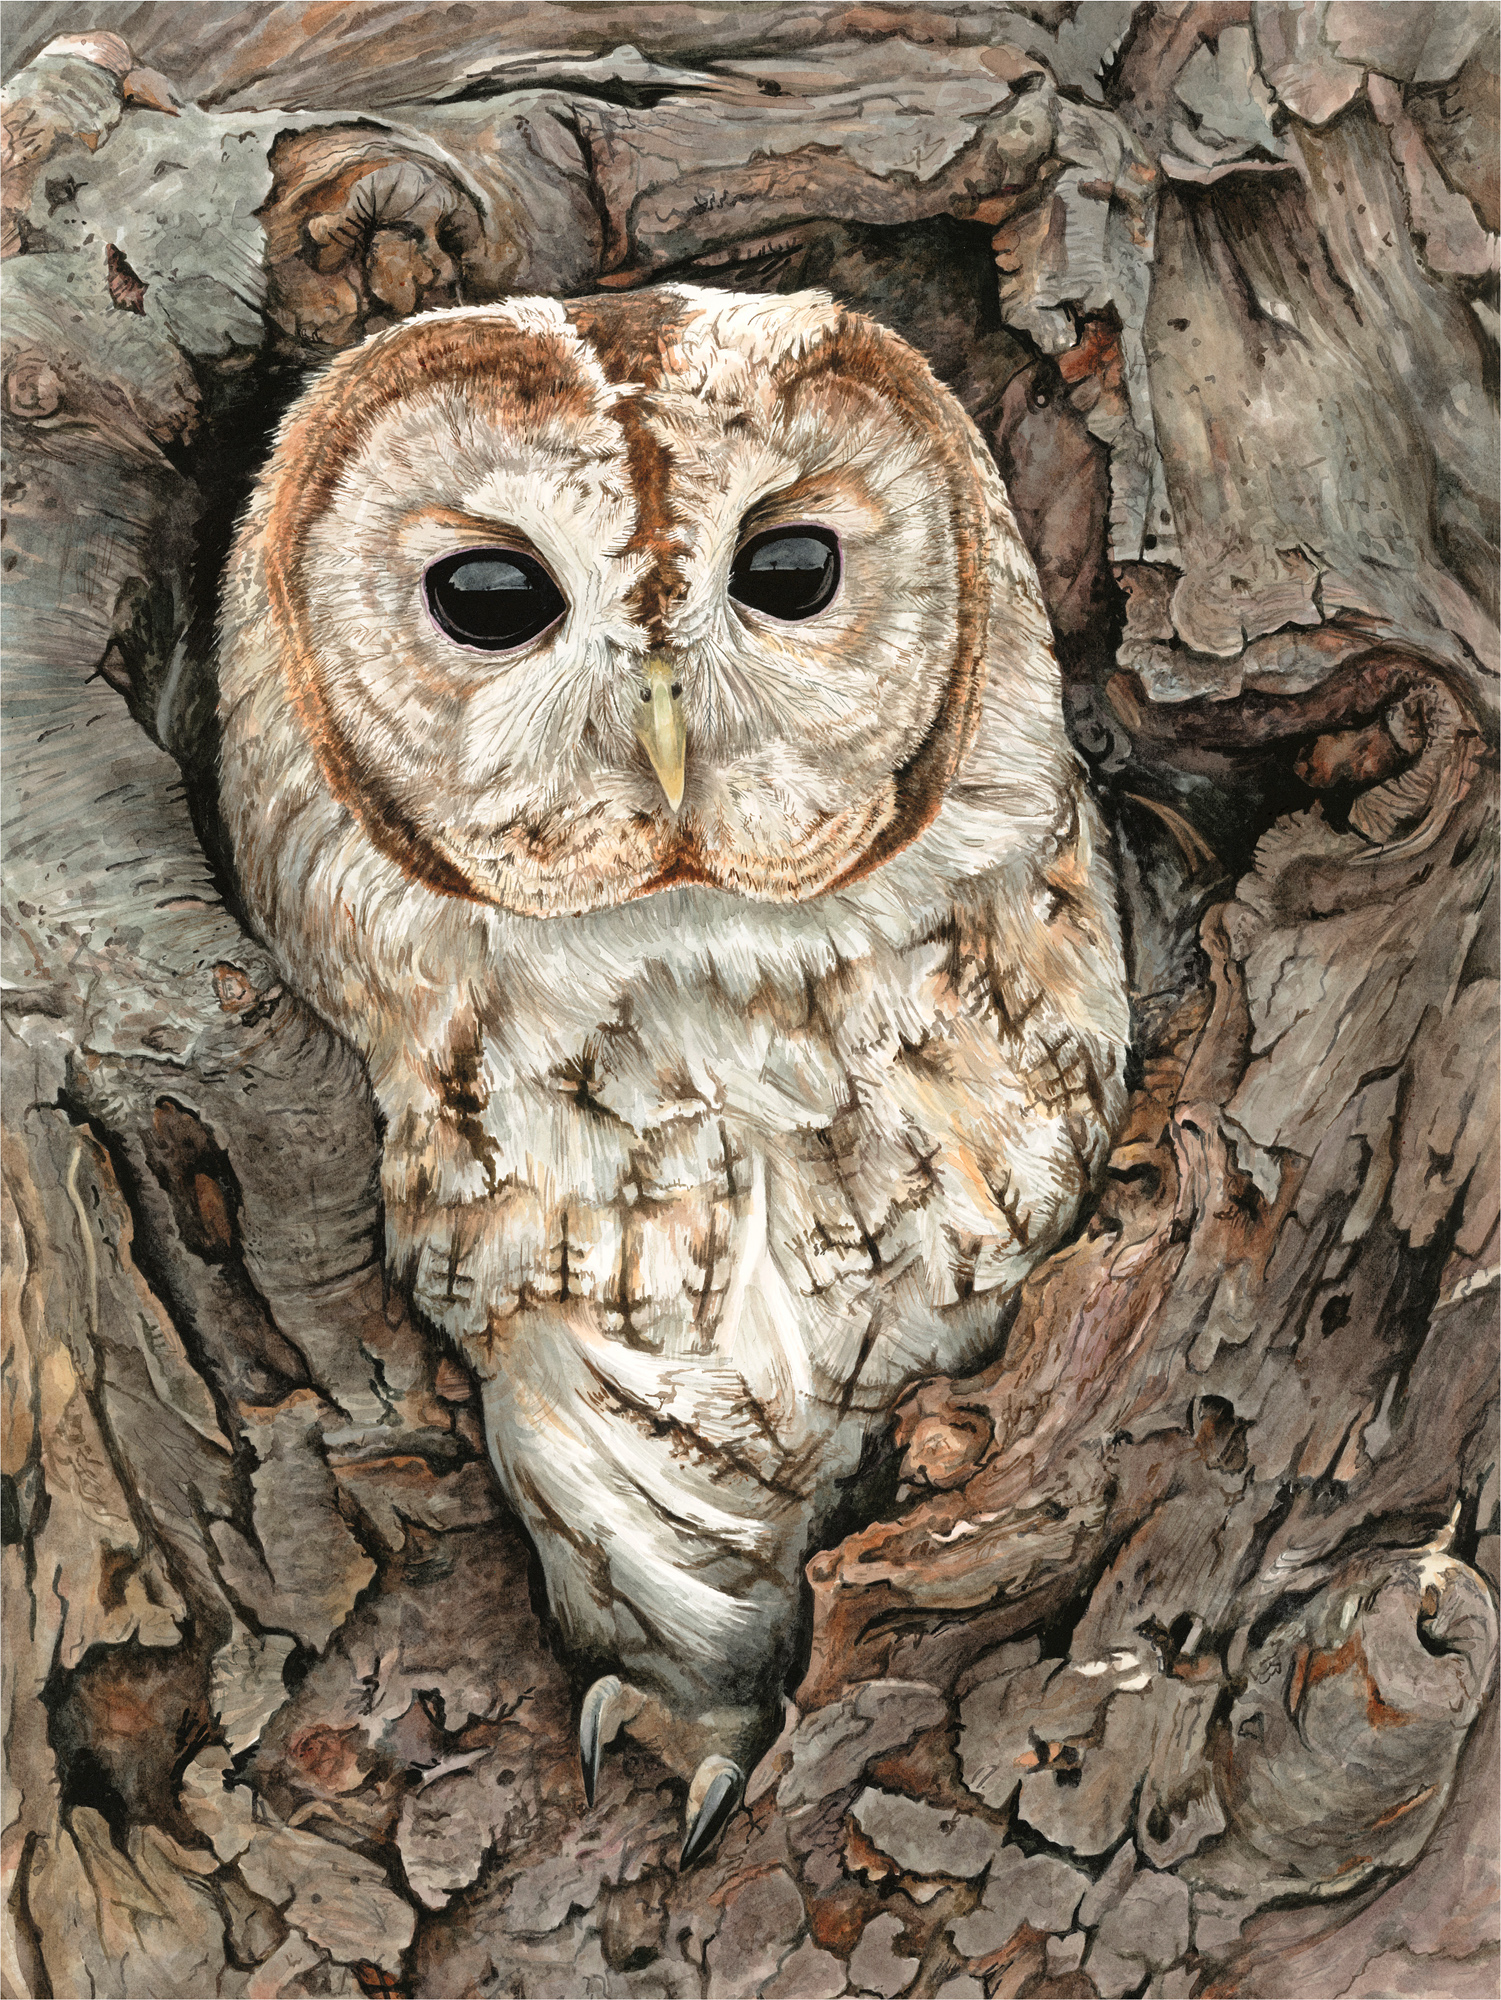 Tawny Owl Anna Mason Watercolour on Illustration Board, 36cm x 49cm, 2015